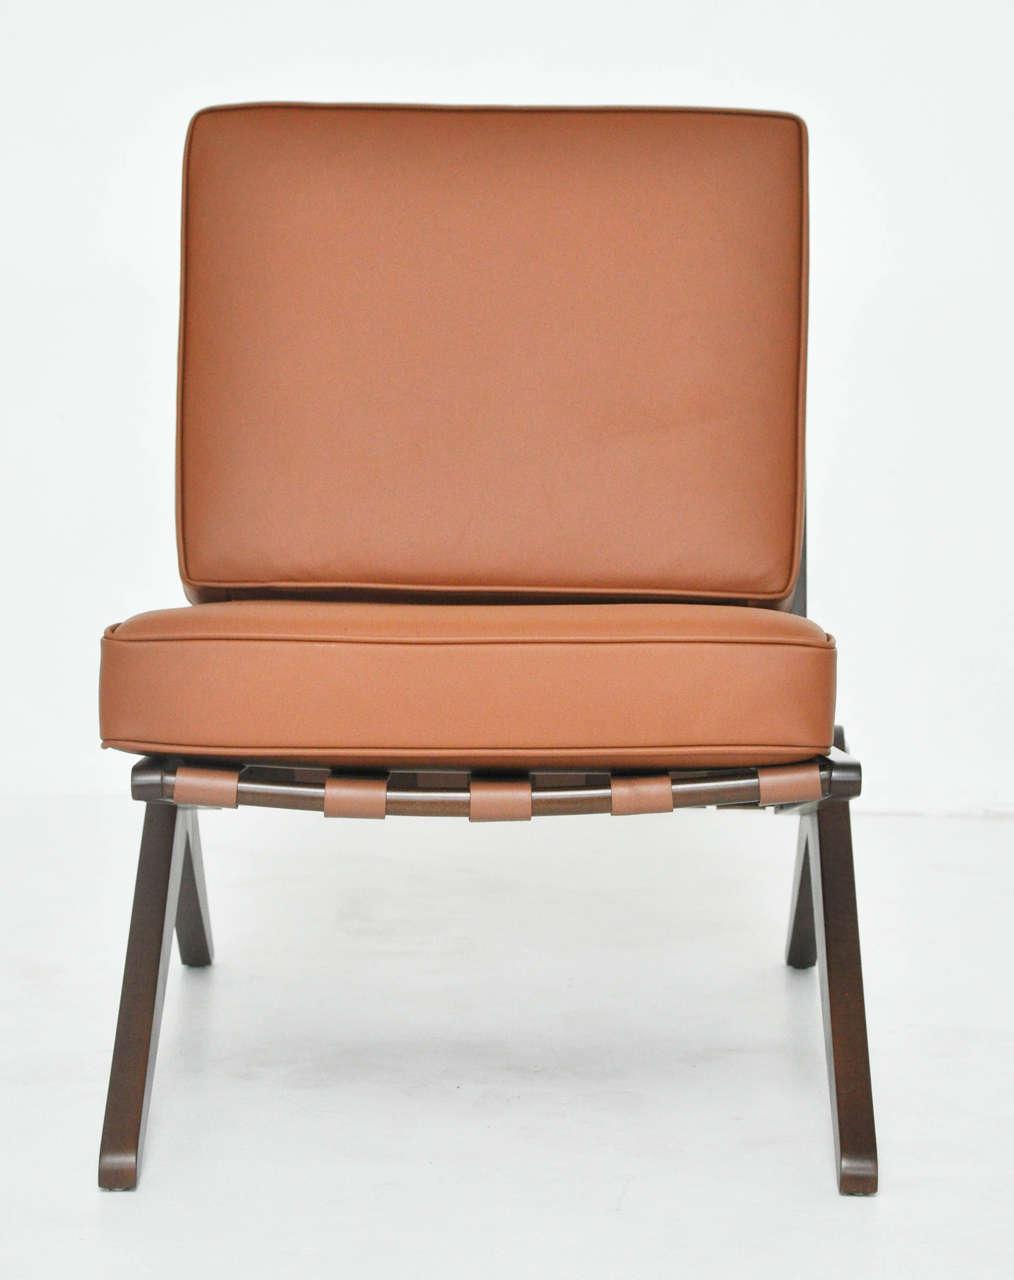 Pierre Jeanneret Scissor Chair At 1stdibs